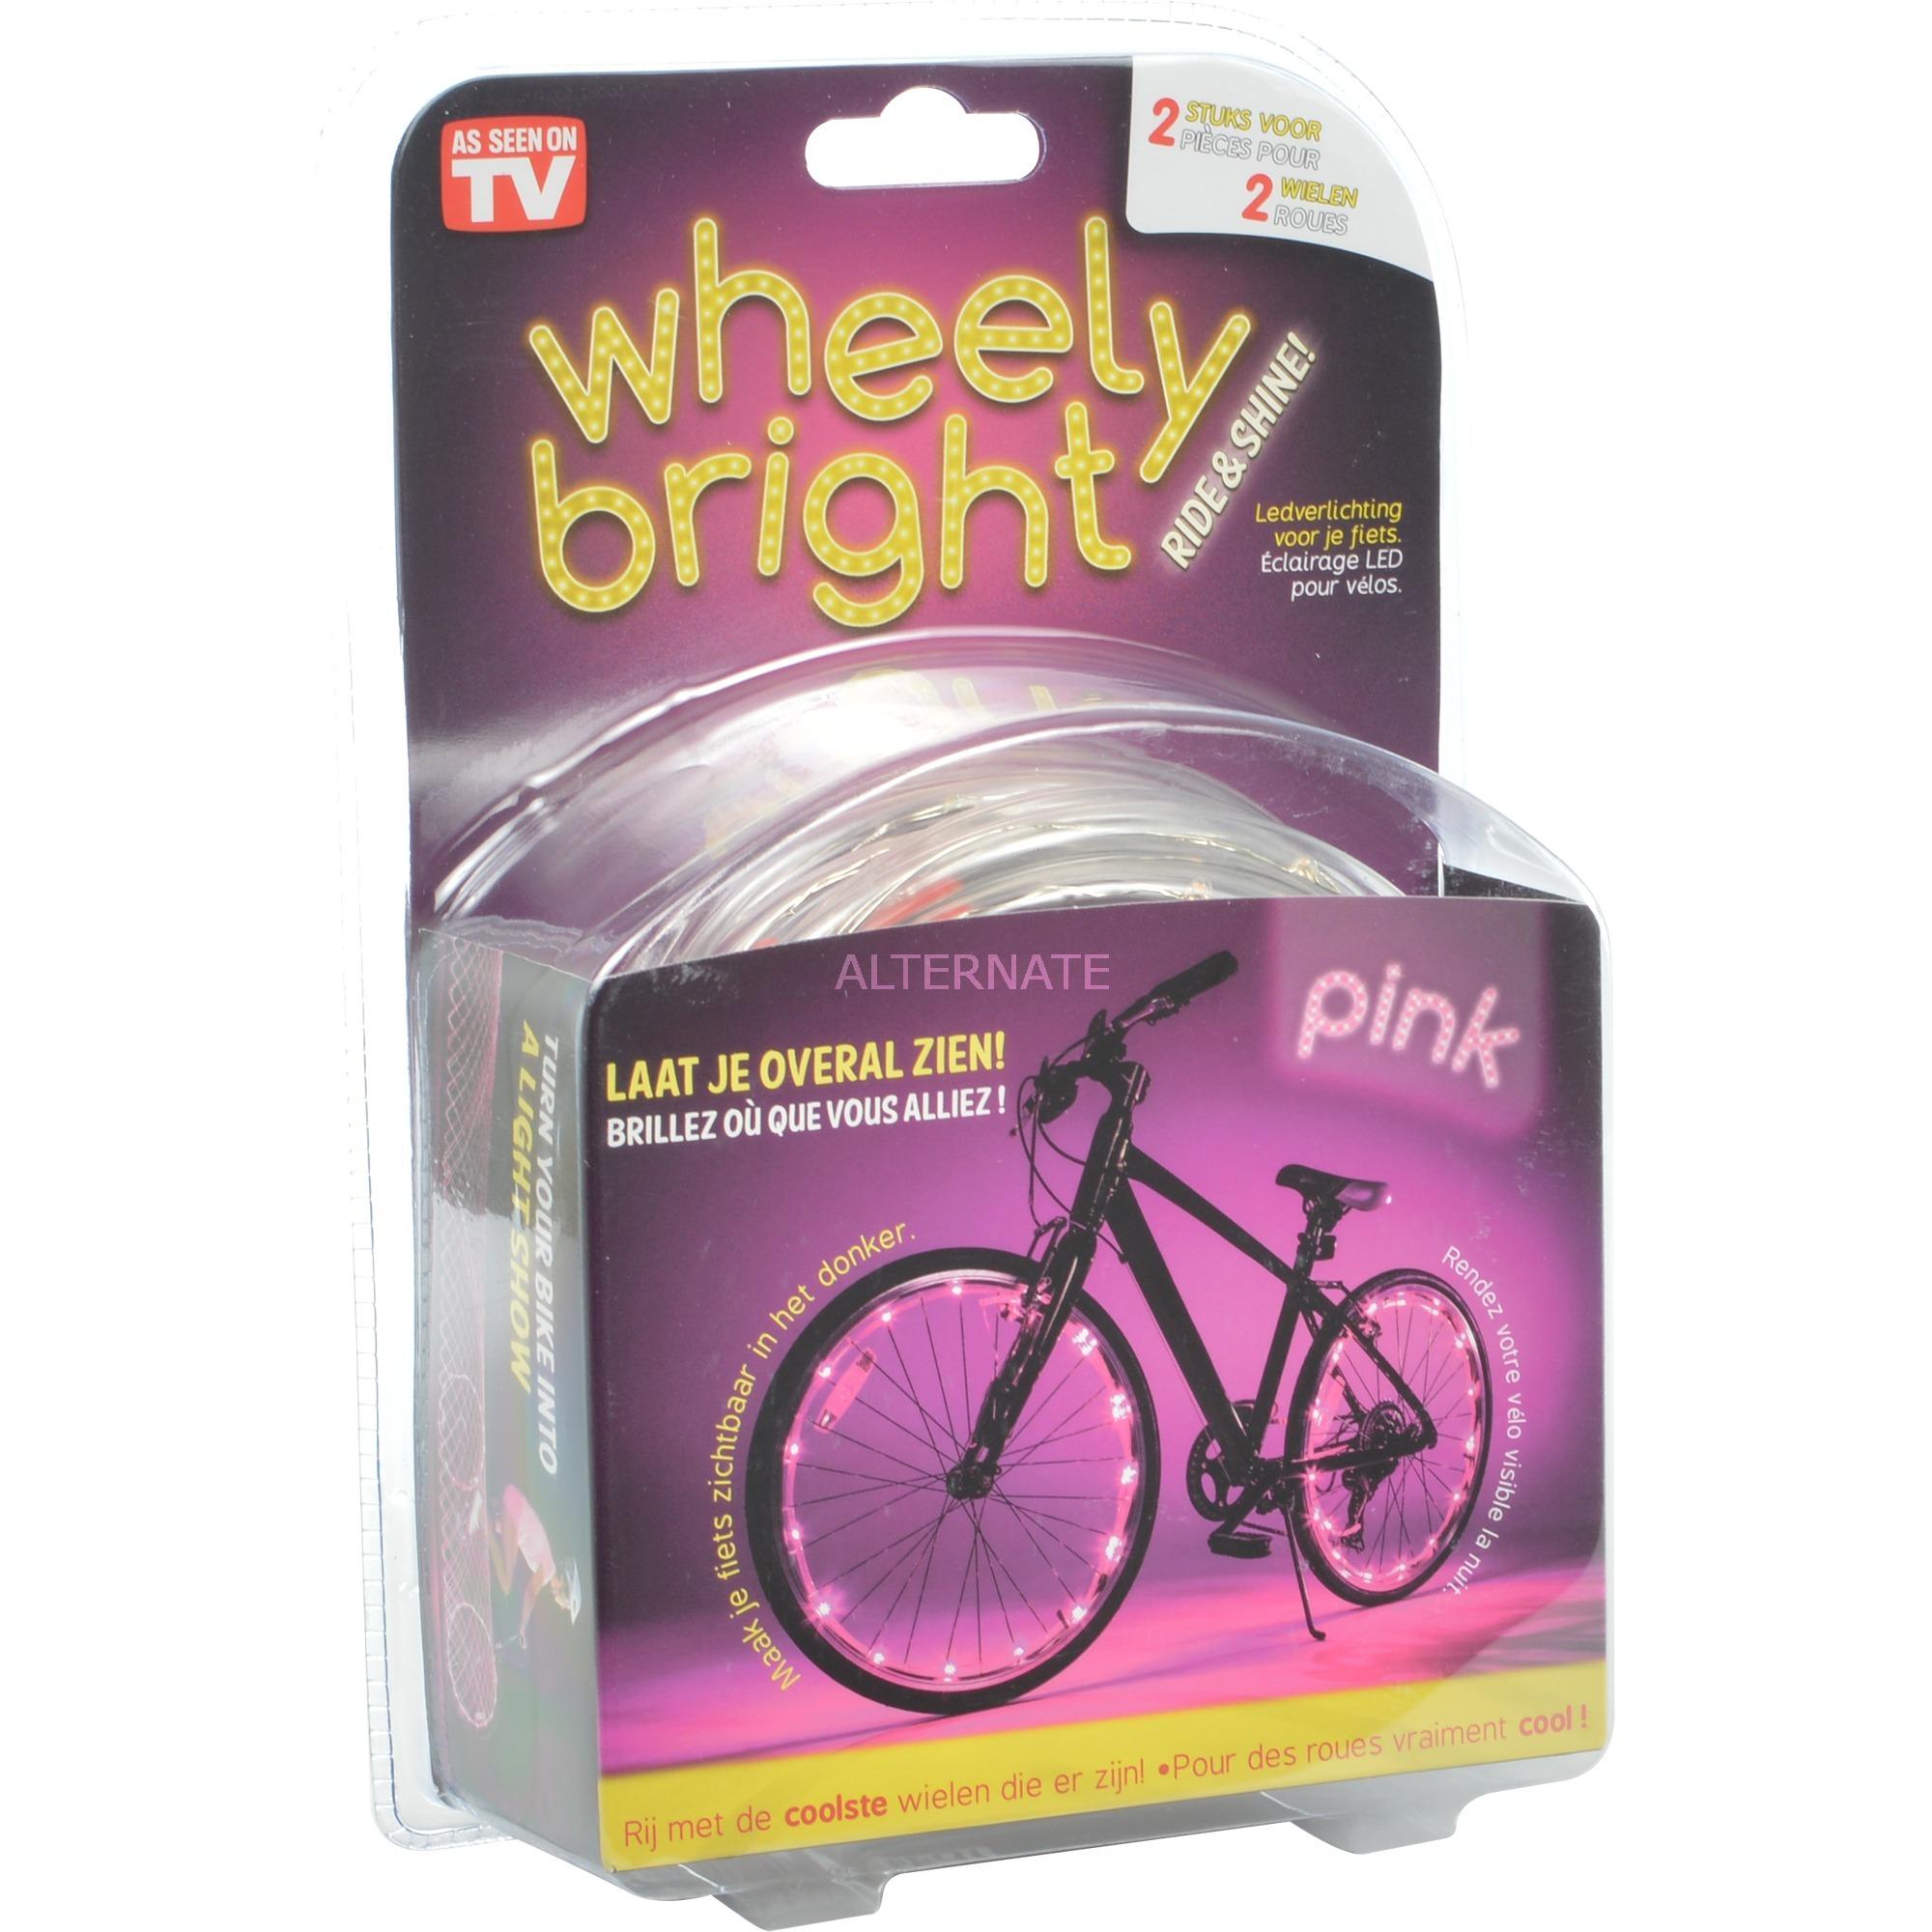 JML Wheely bright roze, 2 stuks verlichting Roze